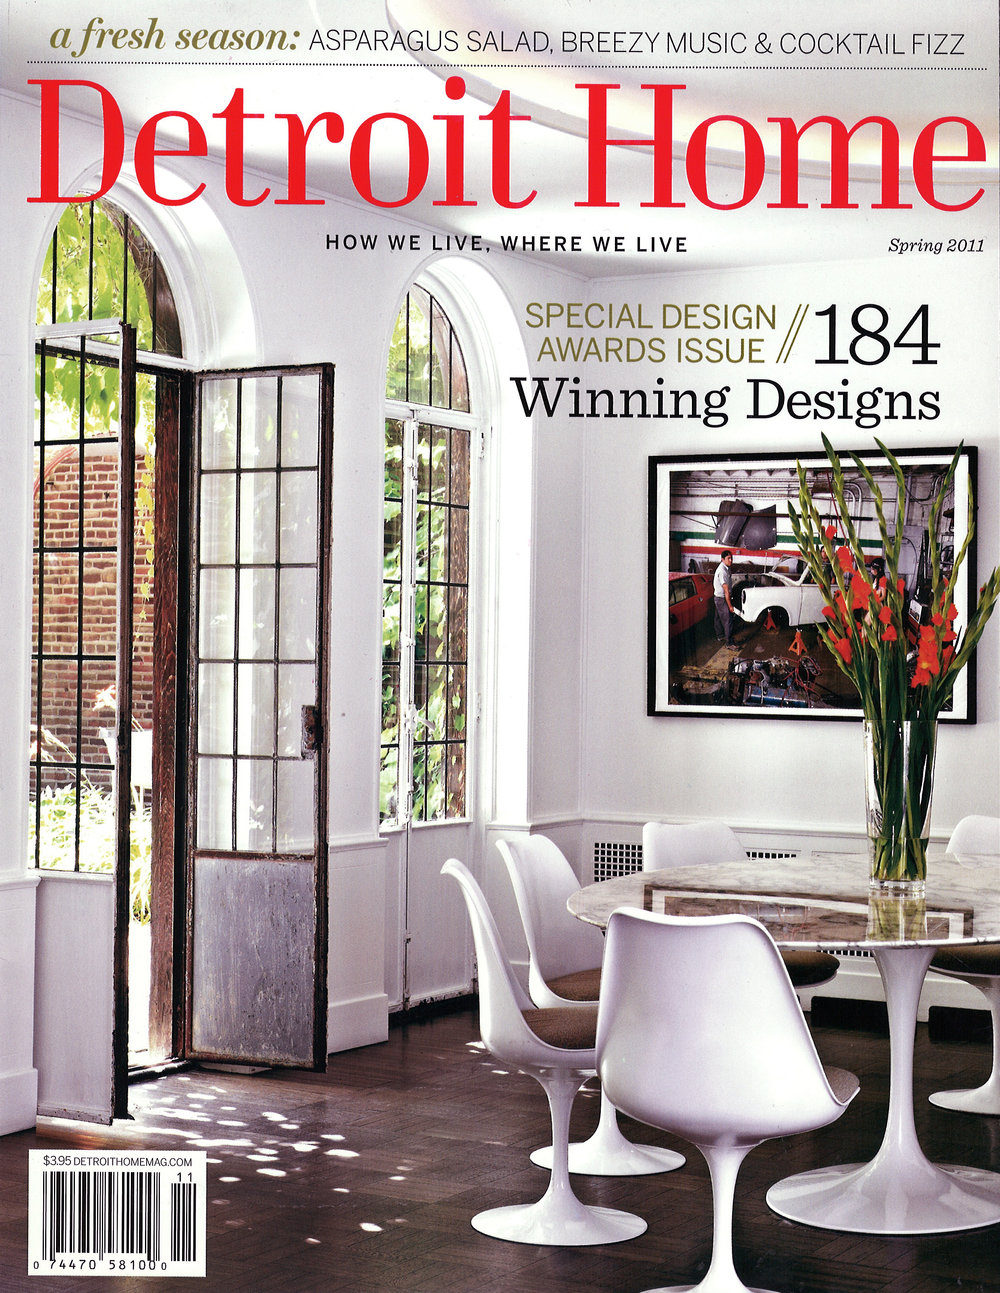 detroithome-spring2011-cover-480h.jpg